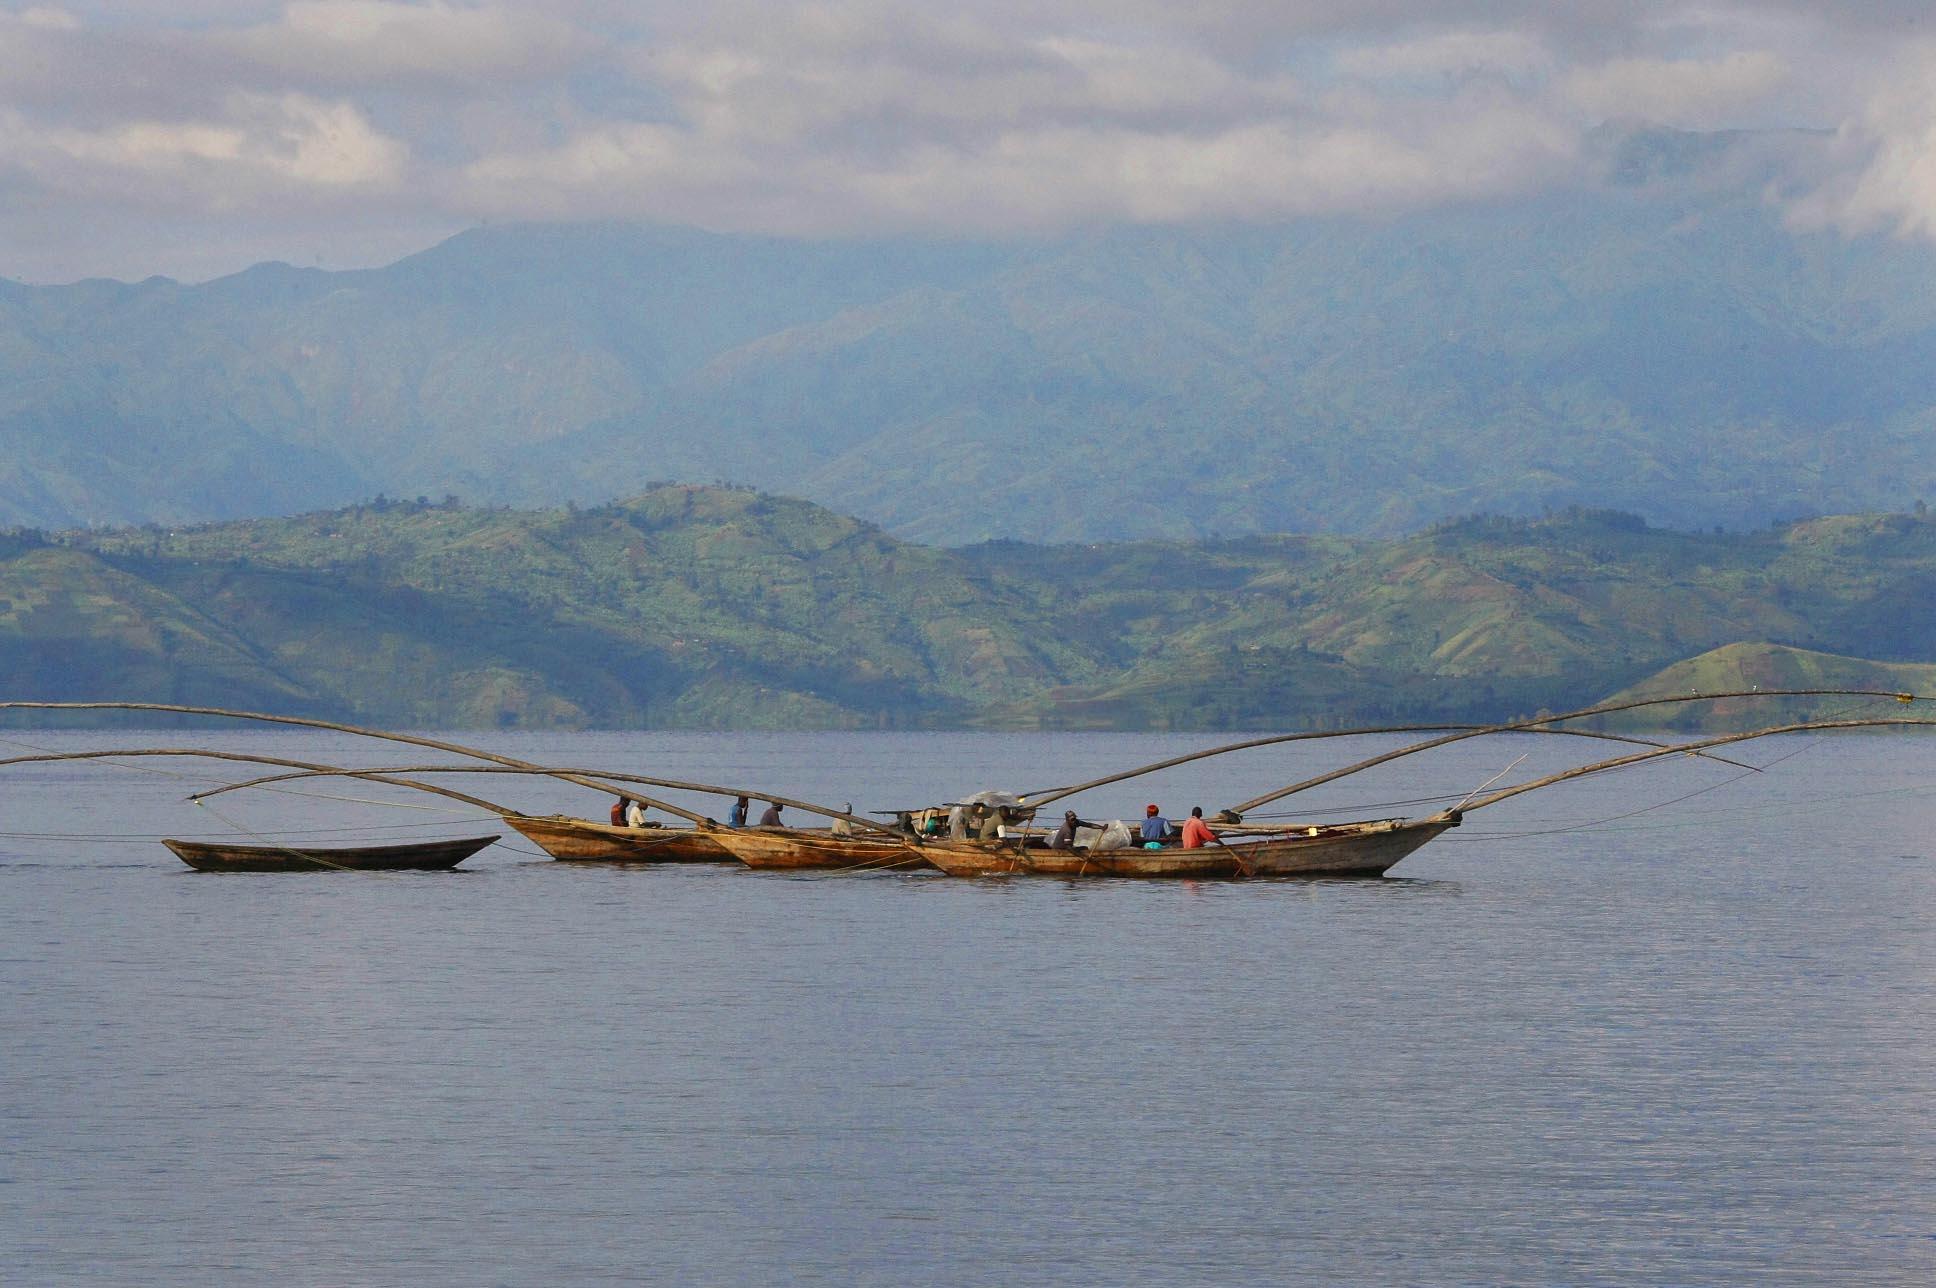 Lake_Kivu,_boats.jpg